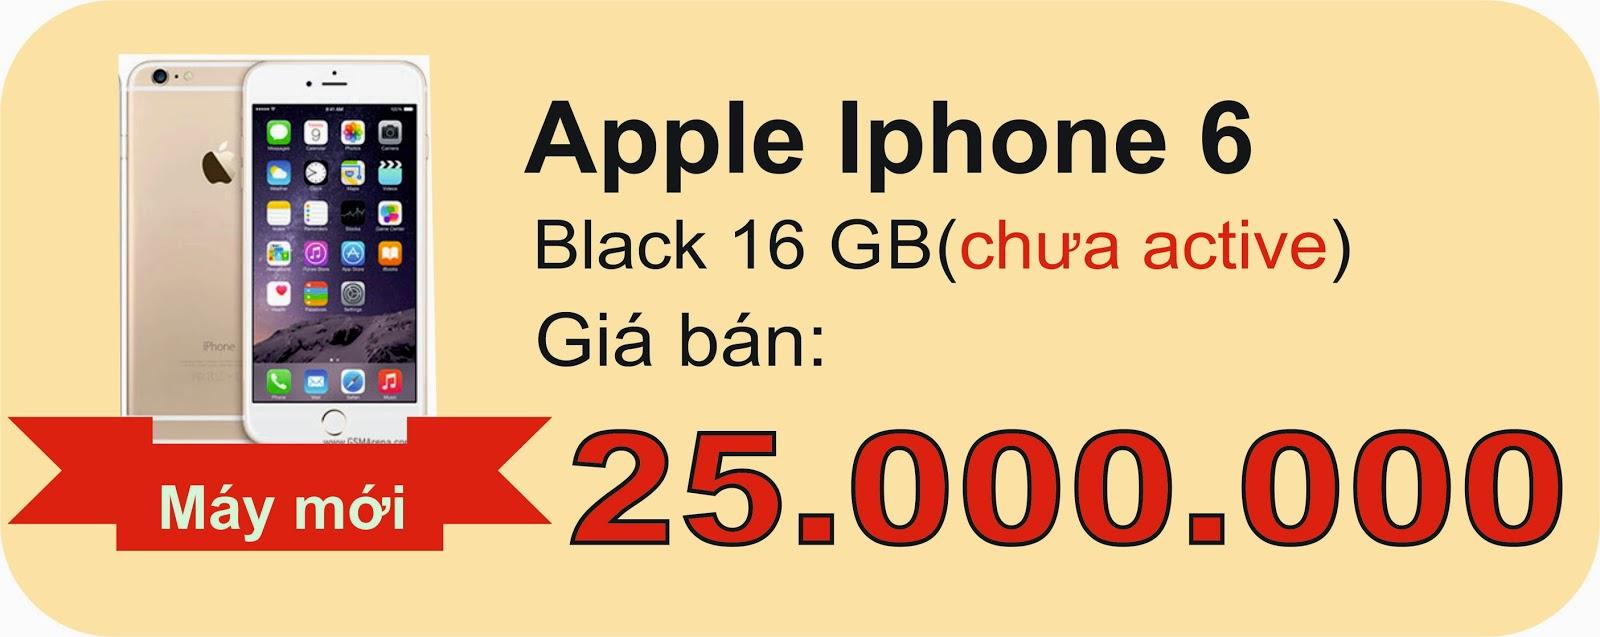 Quangphucmobile có Iphone 6 19/09